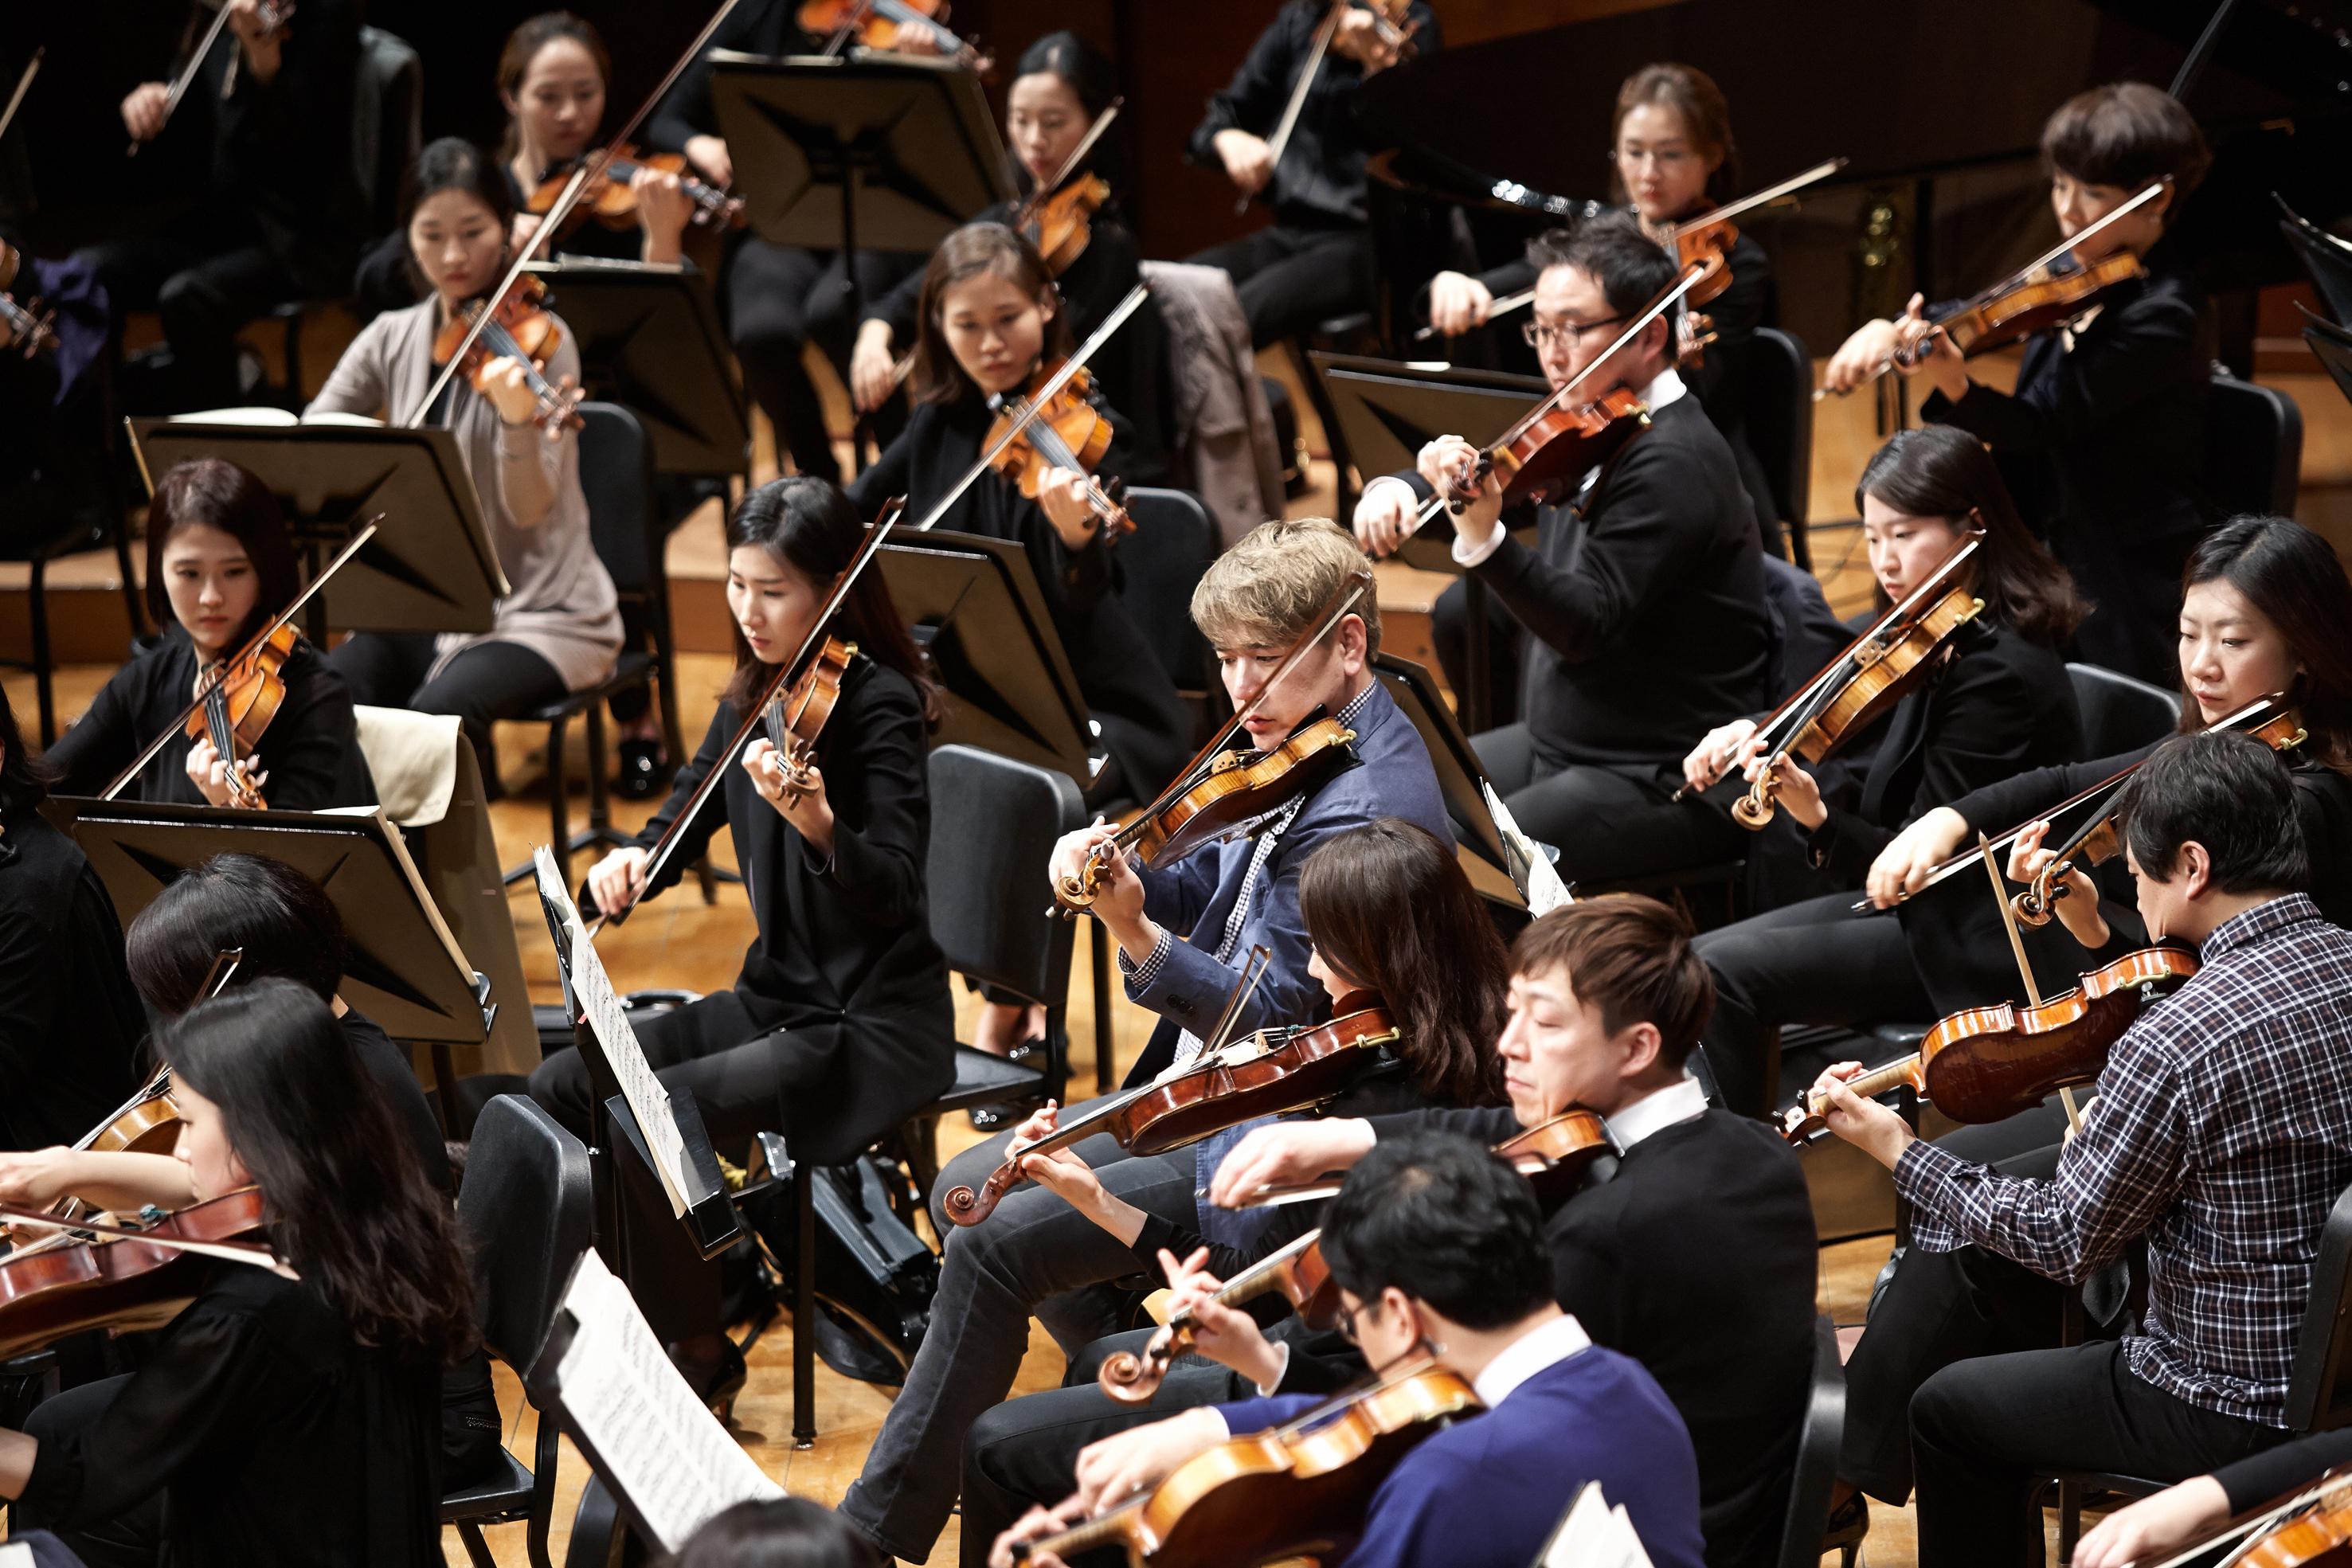 20150404 Cr sympony Gyeonggi Philharmonic 06.jpg